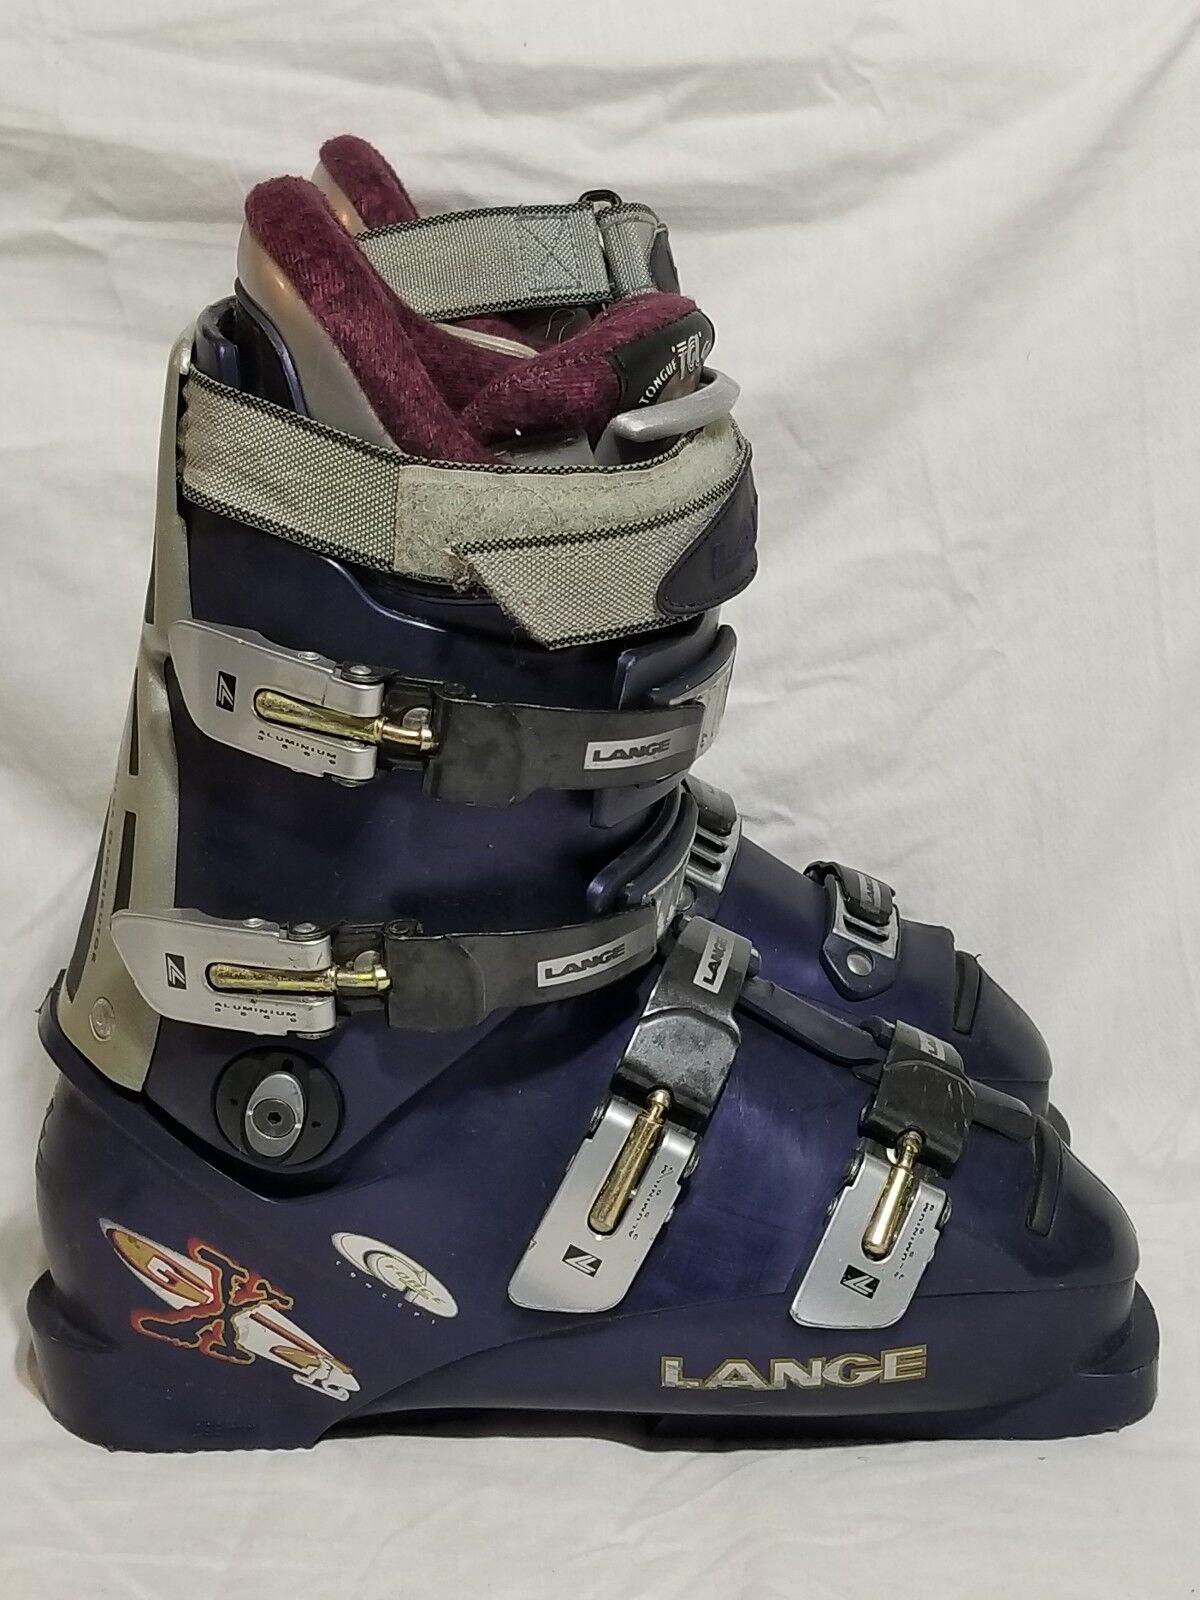 Ski Boots LANGE GX7 Downhill W 298mm G Force Concept TGL Tongue Gel